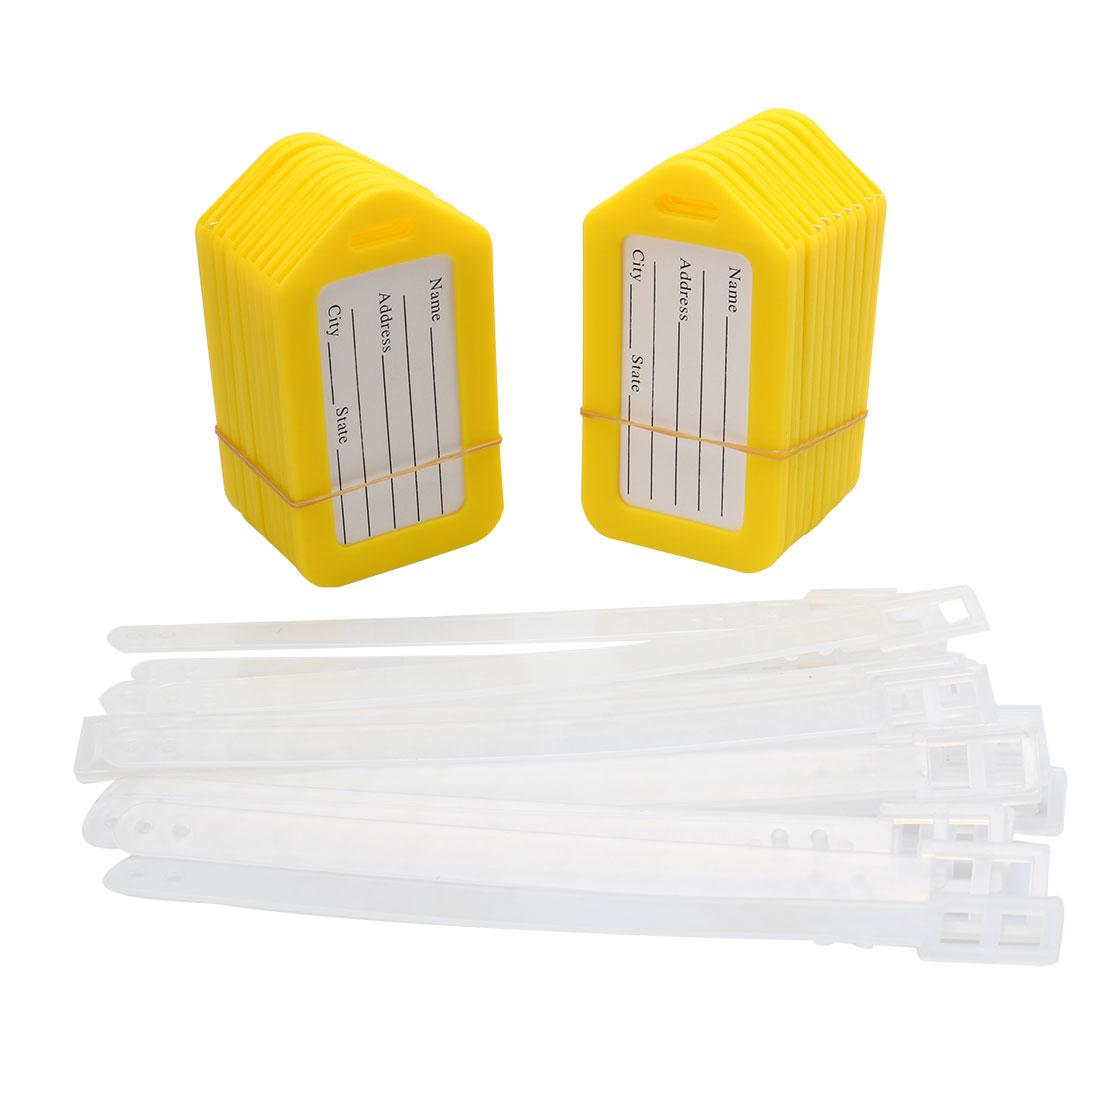 Yellow White Rectangle Shape Plastic Bag ID Name Label Luggage Tag 20 Pcs